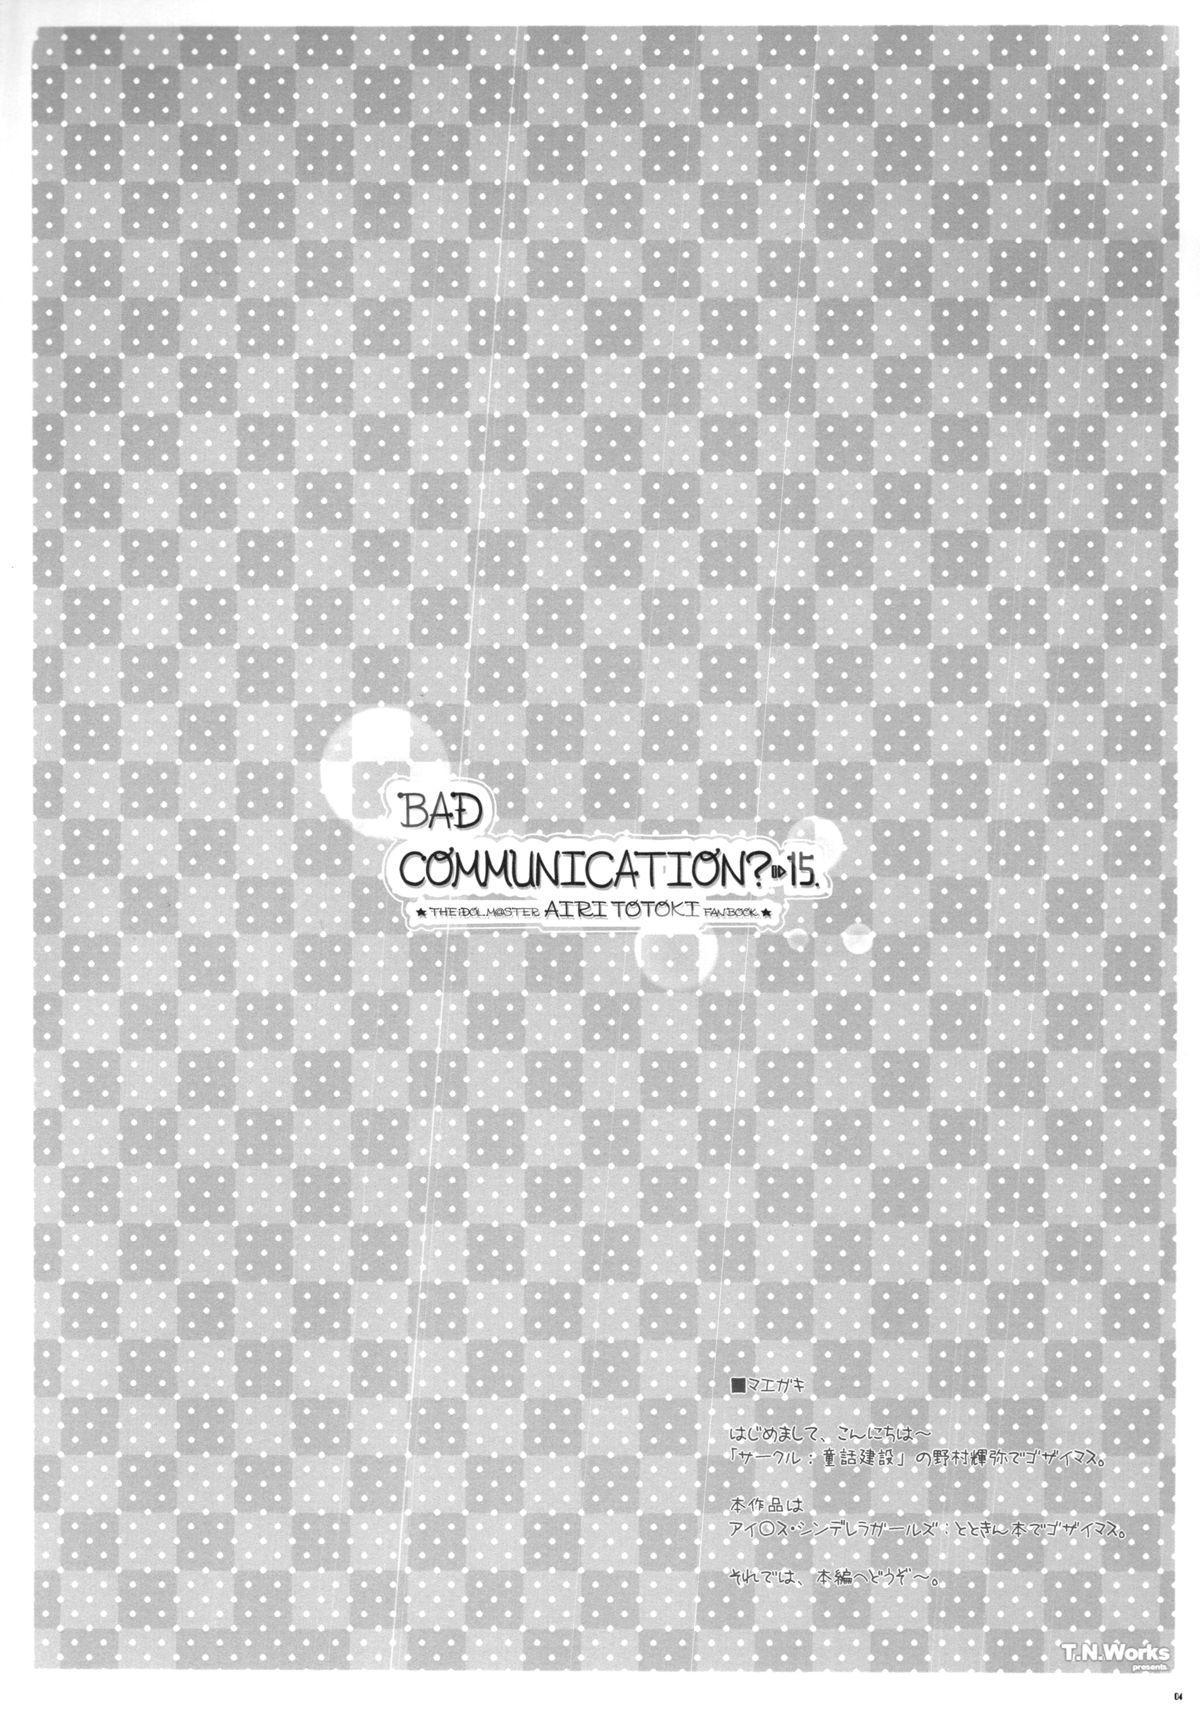 BAD COMMUNICATION? 15 4